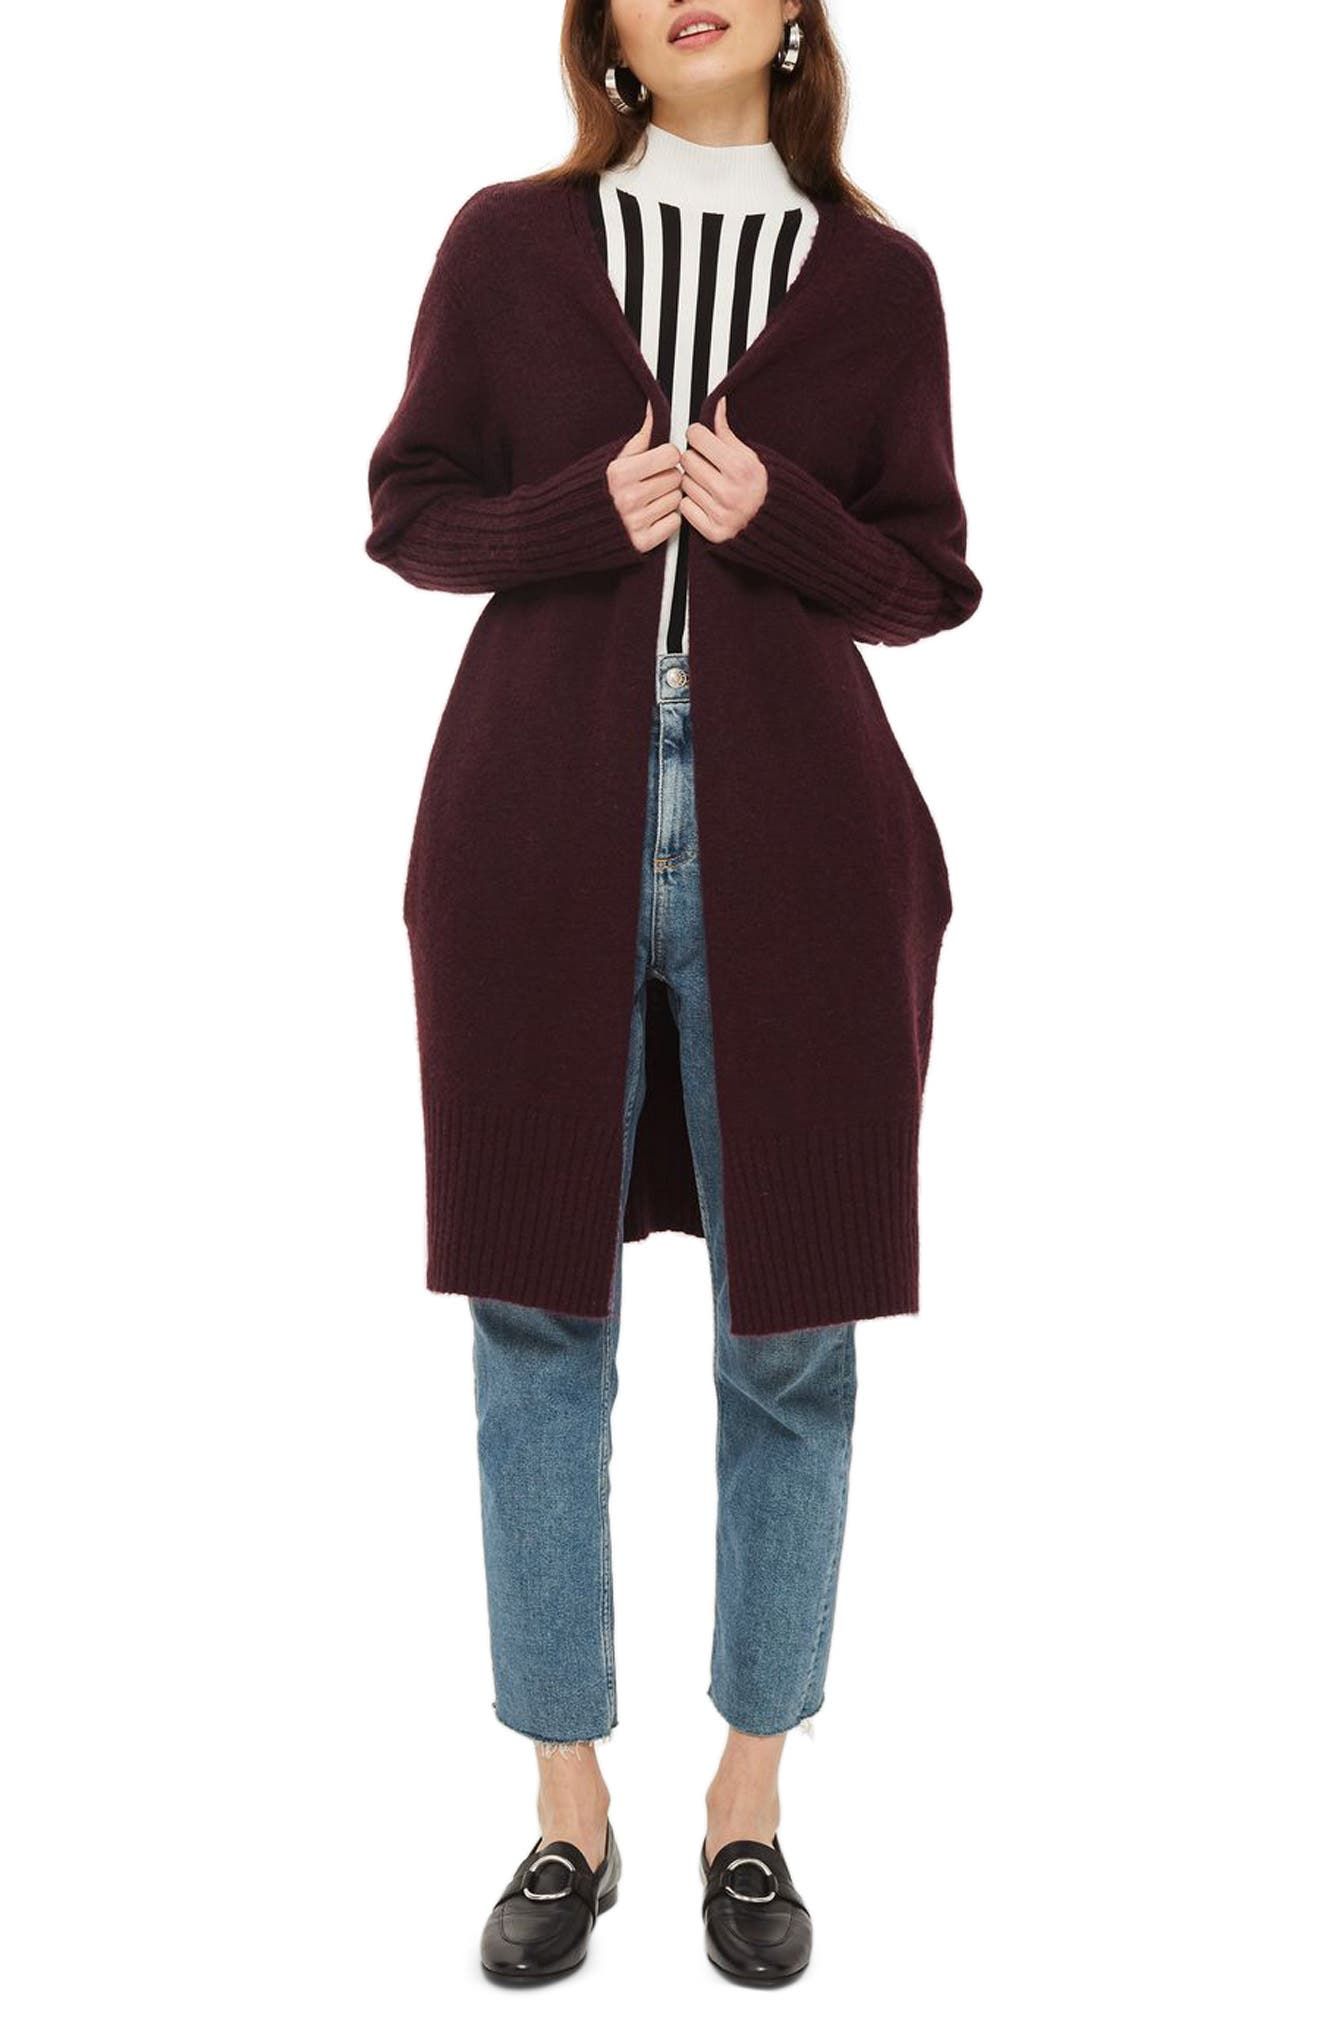 Topshop Puff Sleeve Longline Cardigan